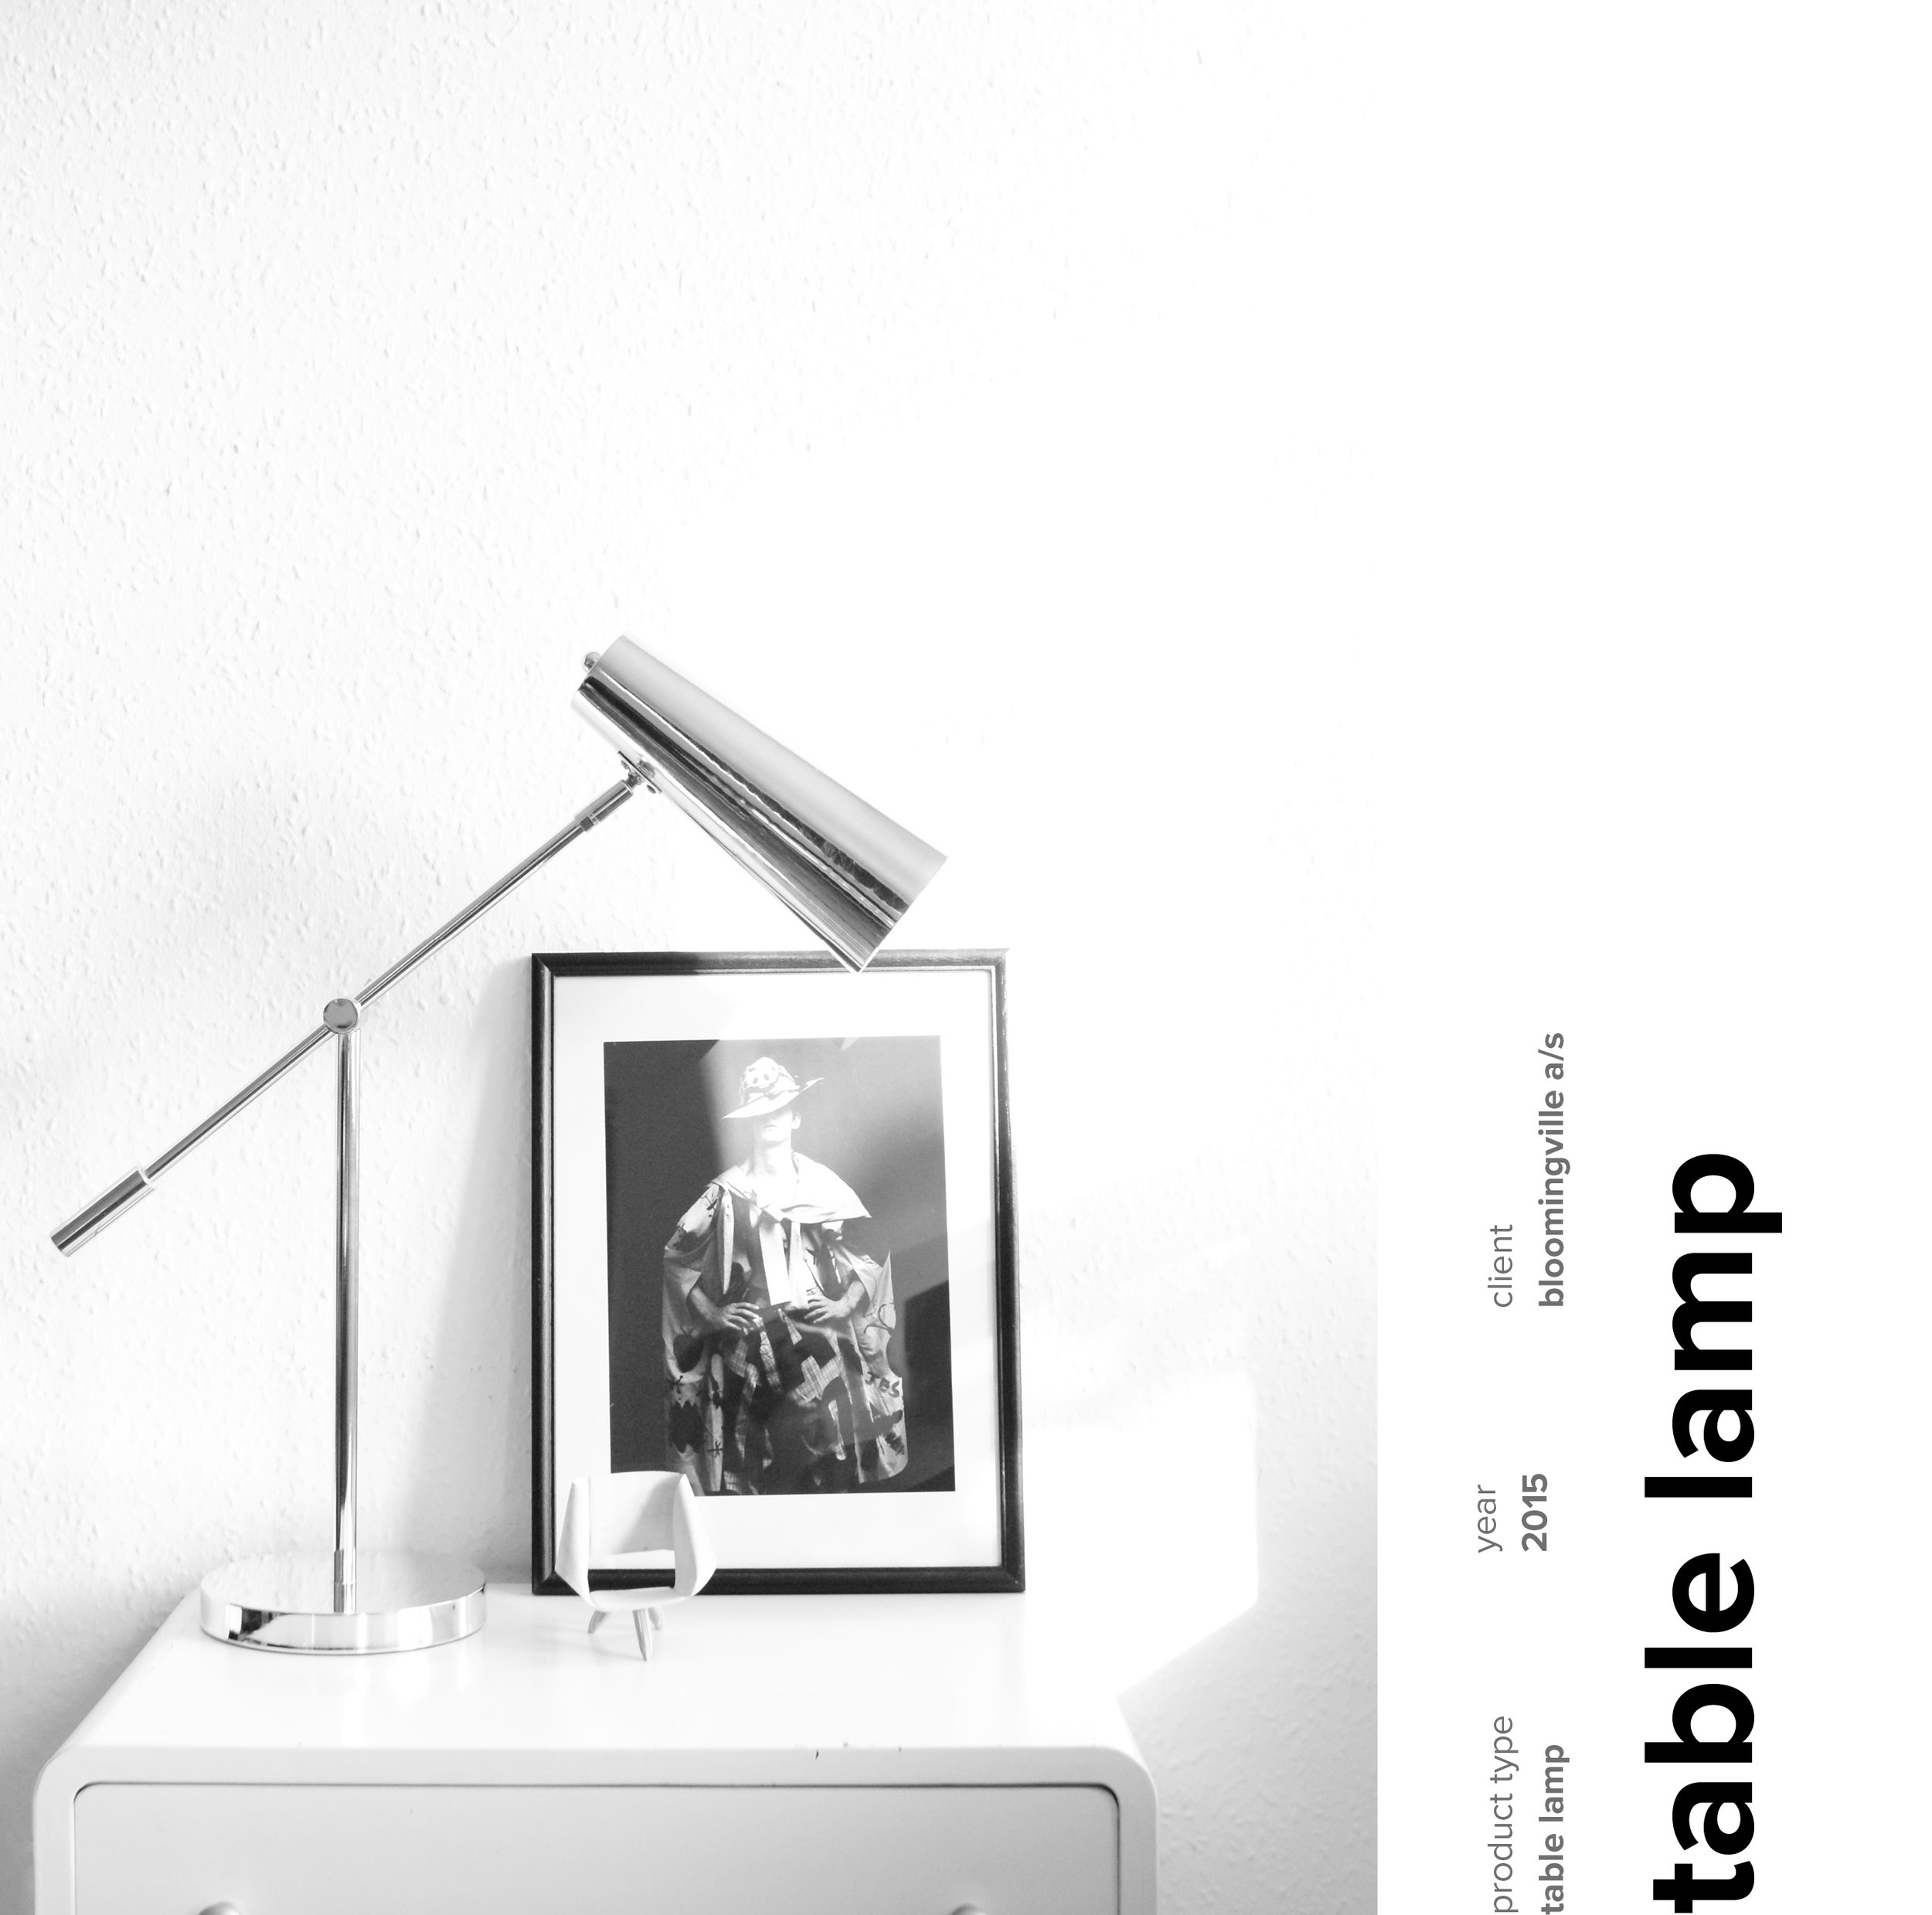 table_lamp_cover.jpg